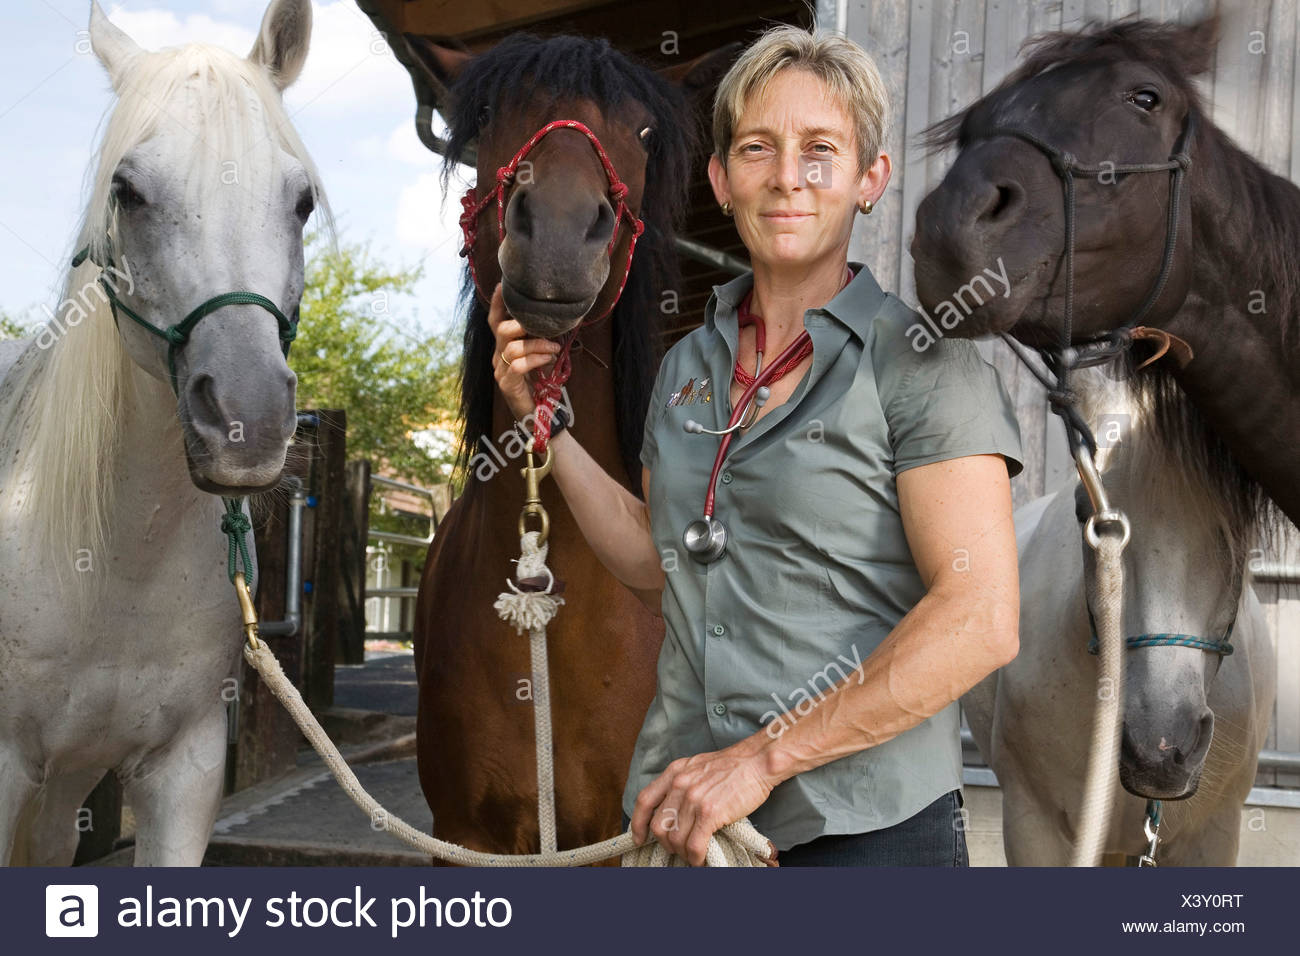 Veterinarian specialising in large animals with her four horses, Steinmaur, Zurich, Switzerland, Europe - Stock Image